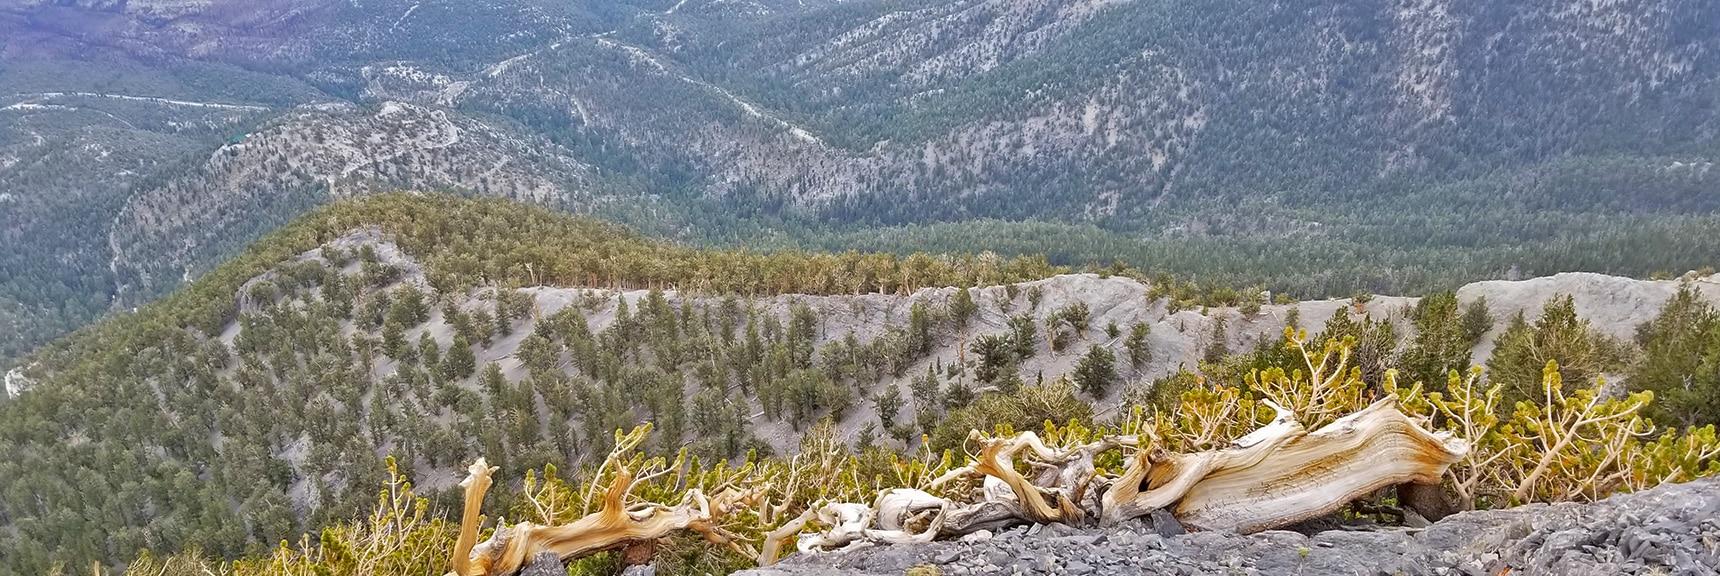 Ridge Below the Eastern Summit Cliffs, Potential Summit Route   Mummy Mountain Northern Rim Overlook, Spring Mountain Wilderness, Nevada